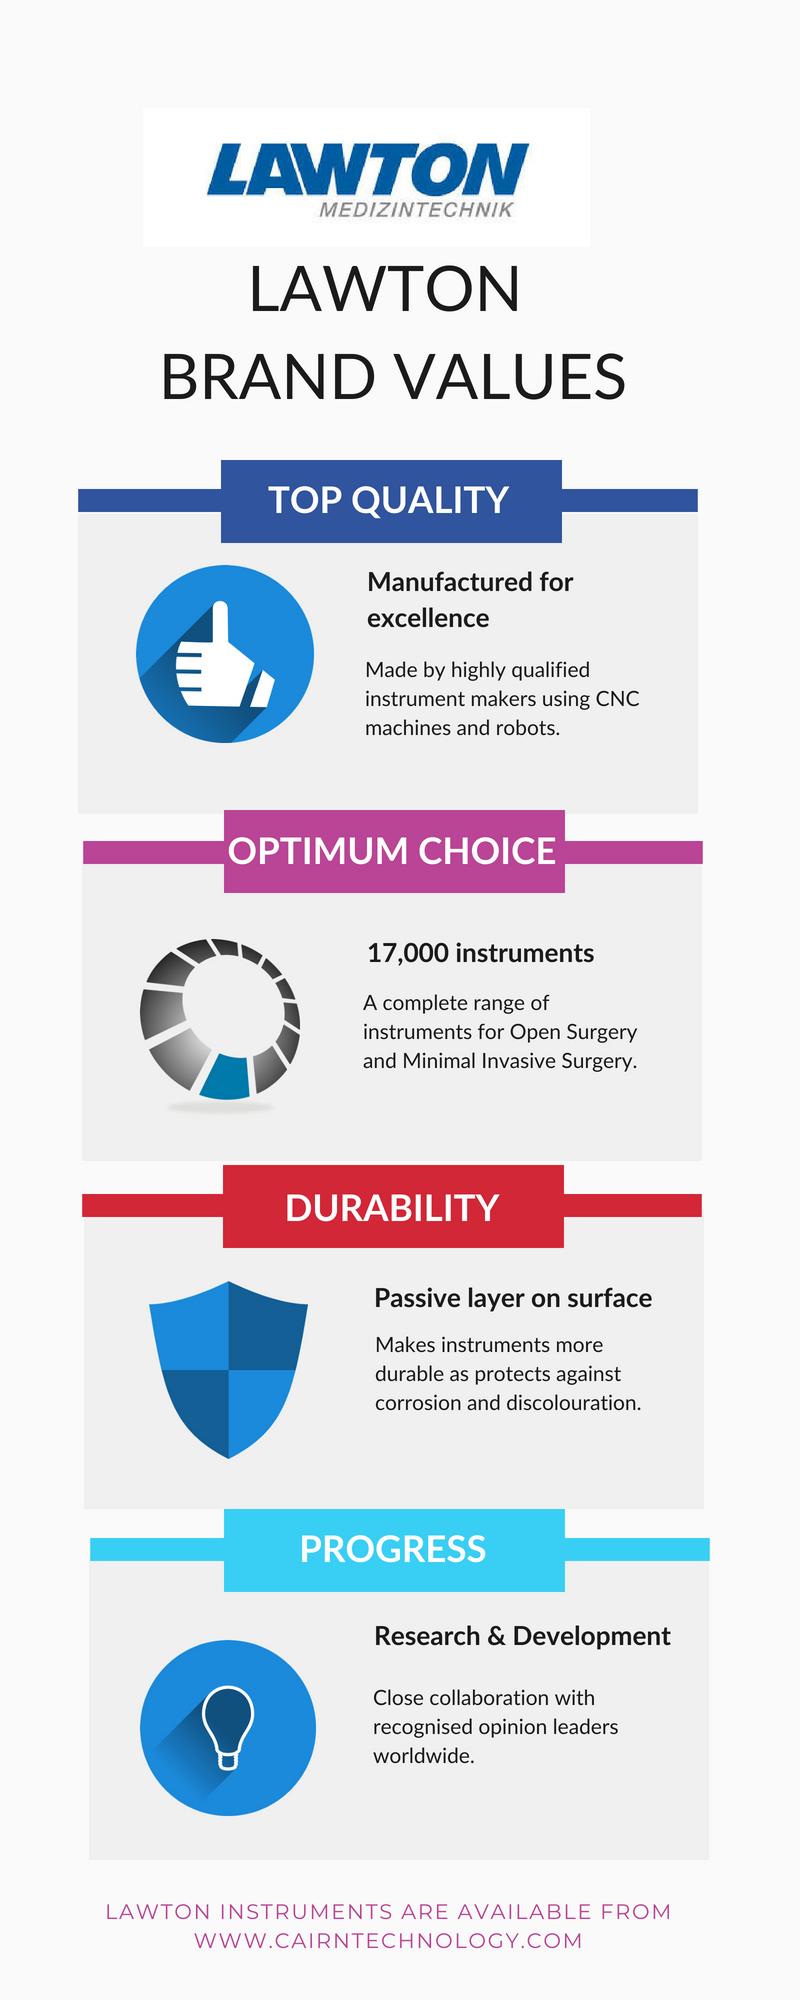 Lawton Brand Values Infographic.jpg